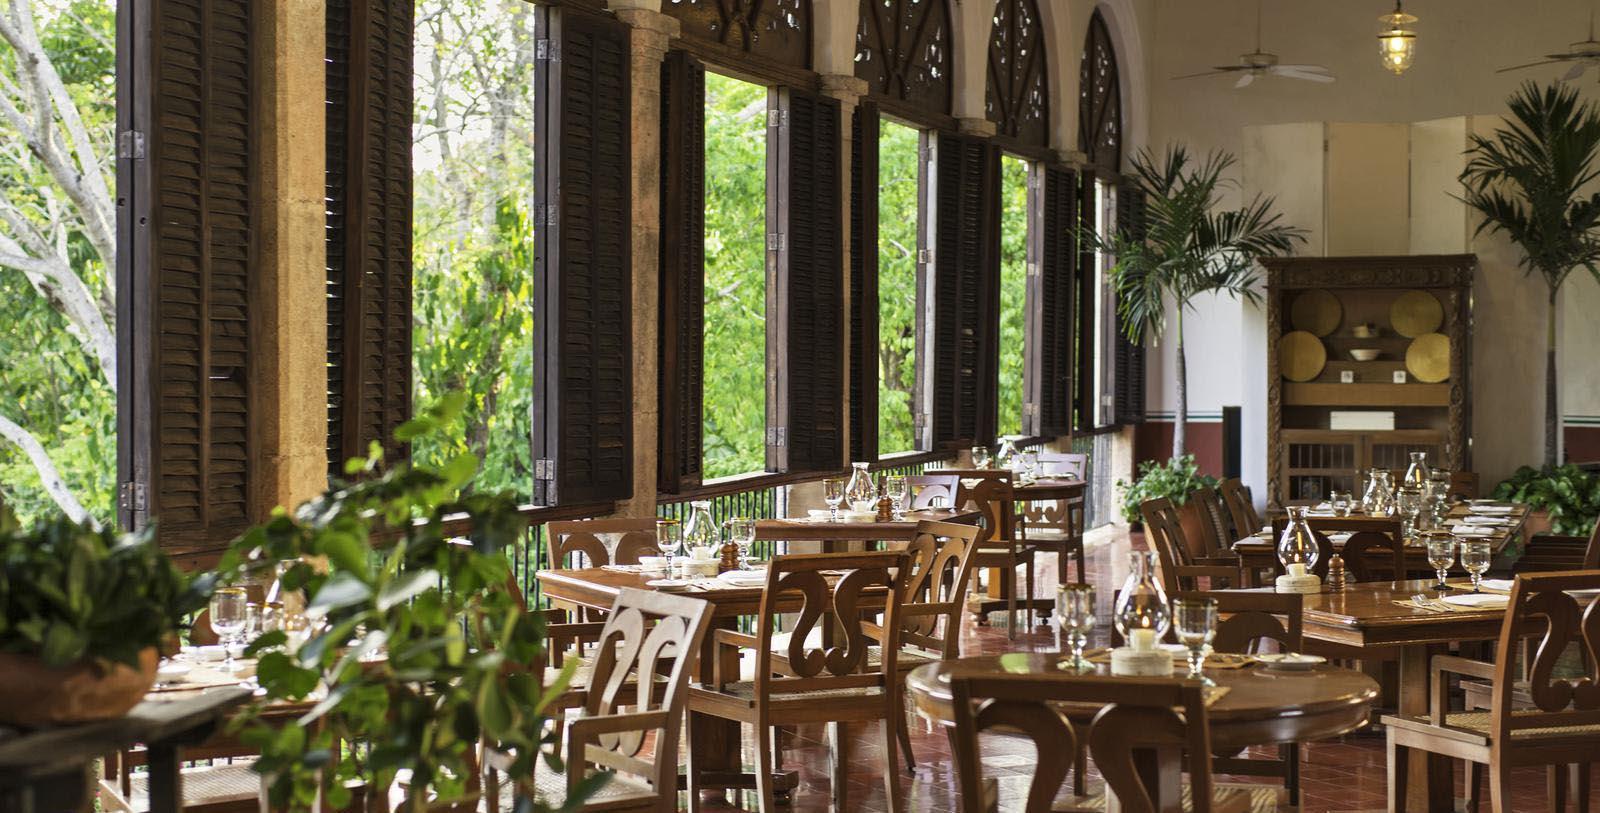 Image of Casa Temozon Restaurant, Hacienda Temozon, A Luxury Collection Hotel, Temozon Sur, Mexico, 1655, Member of Historic Hotels Worldwide, Taste